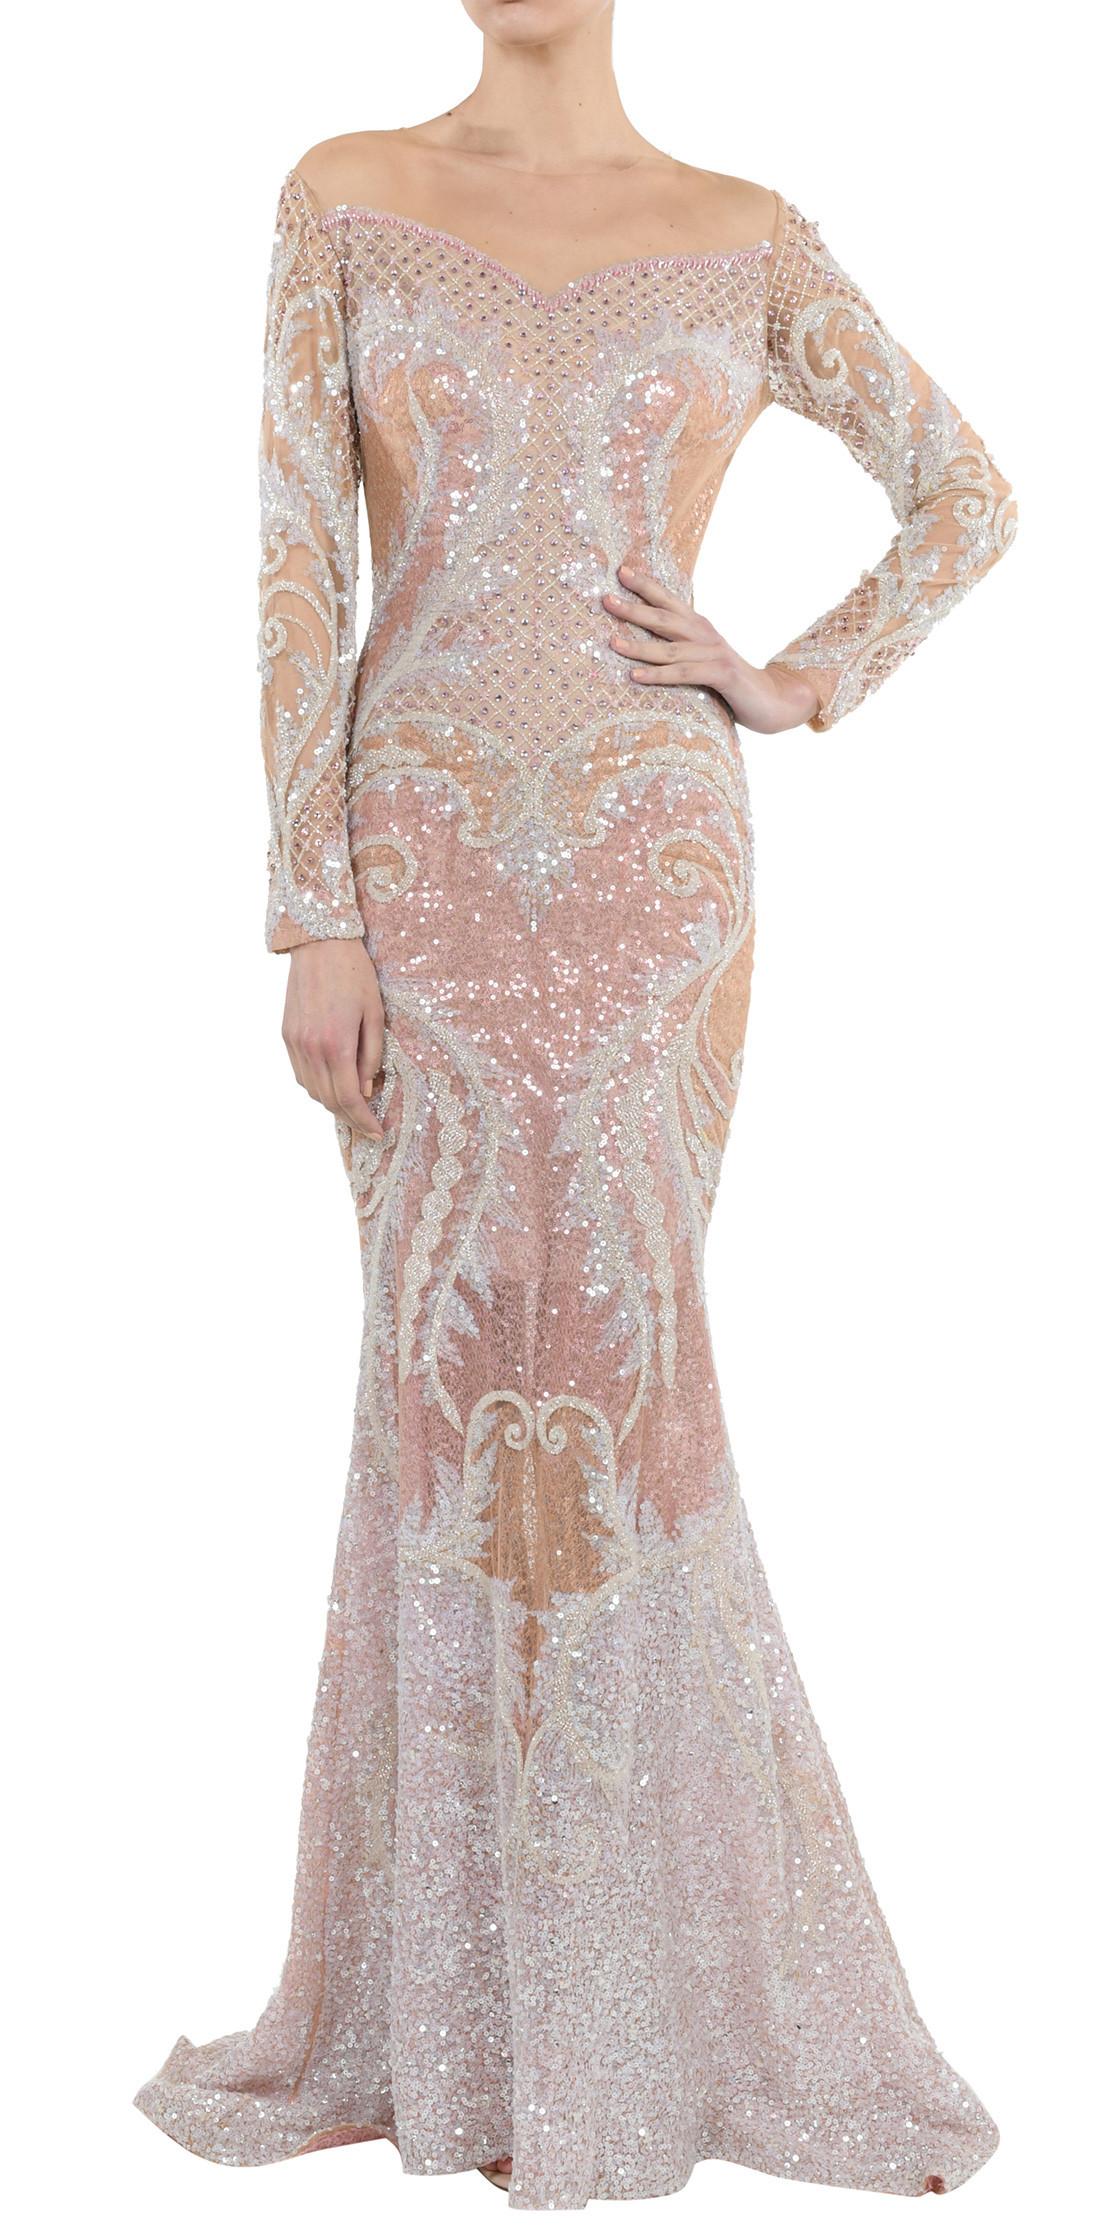 Nicolas Jebran Sequined Mermaid Gown | Evening Dress Rental ...